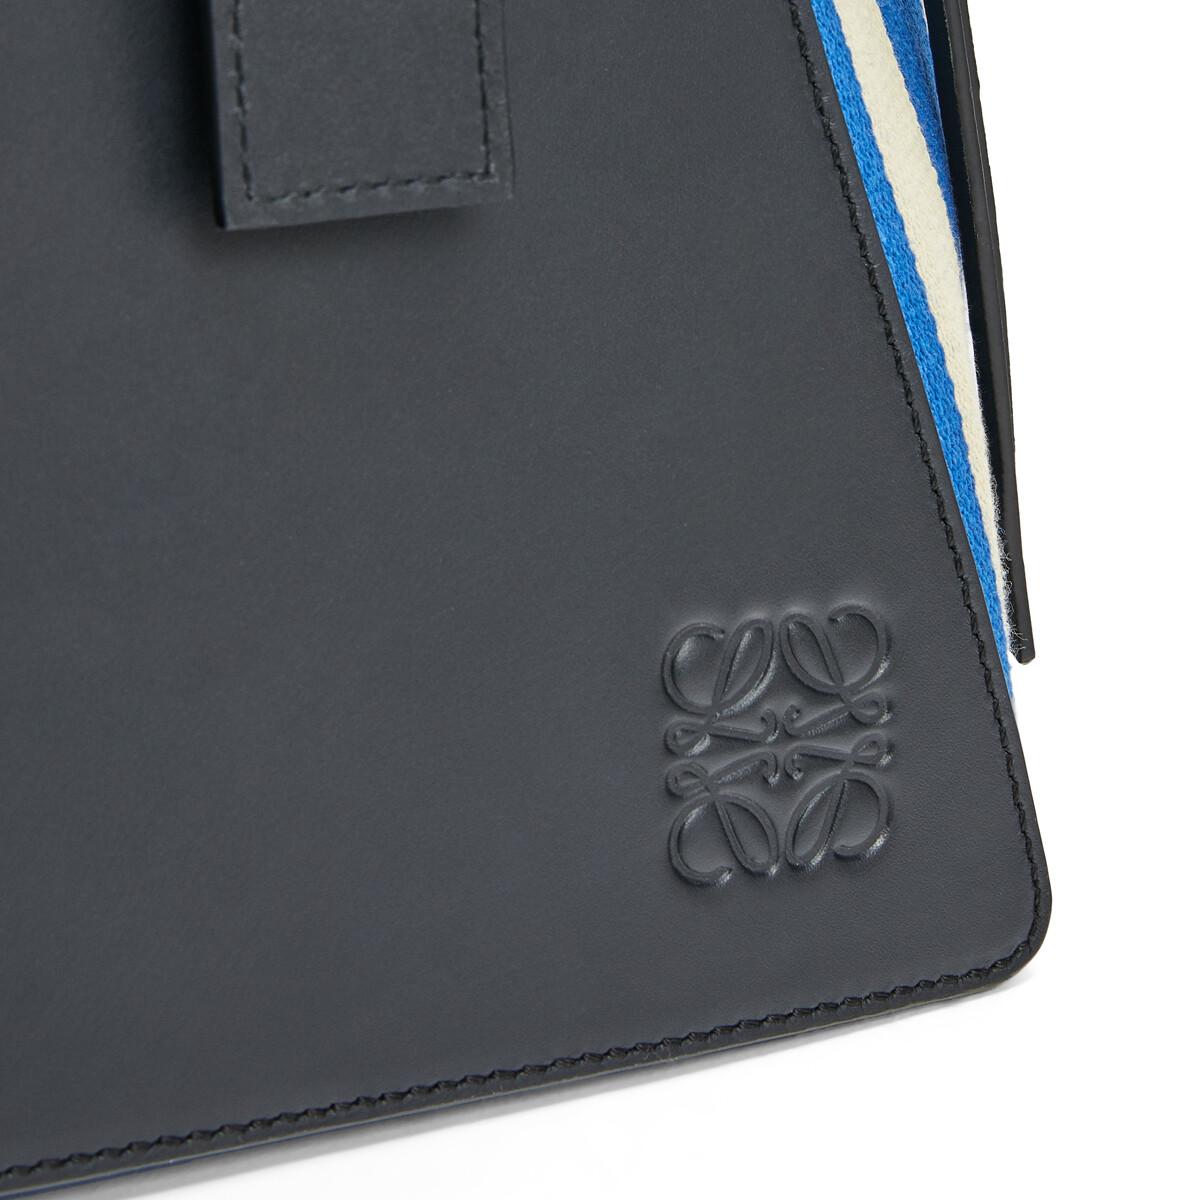 LOEWE Berlingo Stripes Bag white/blue front